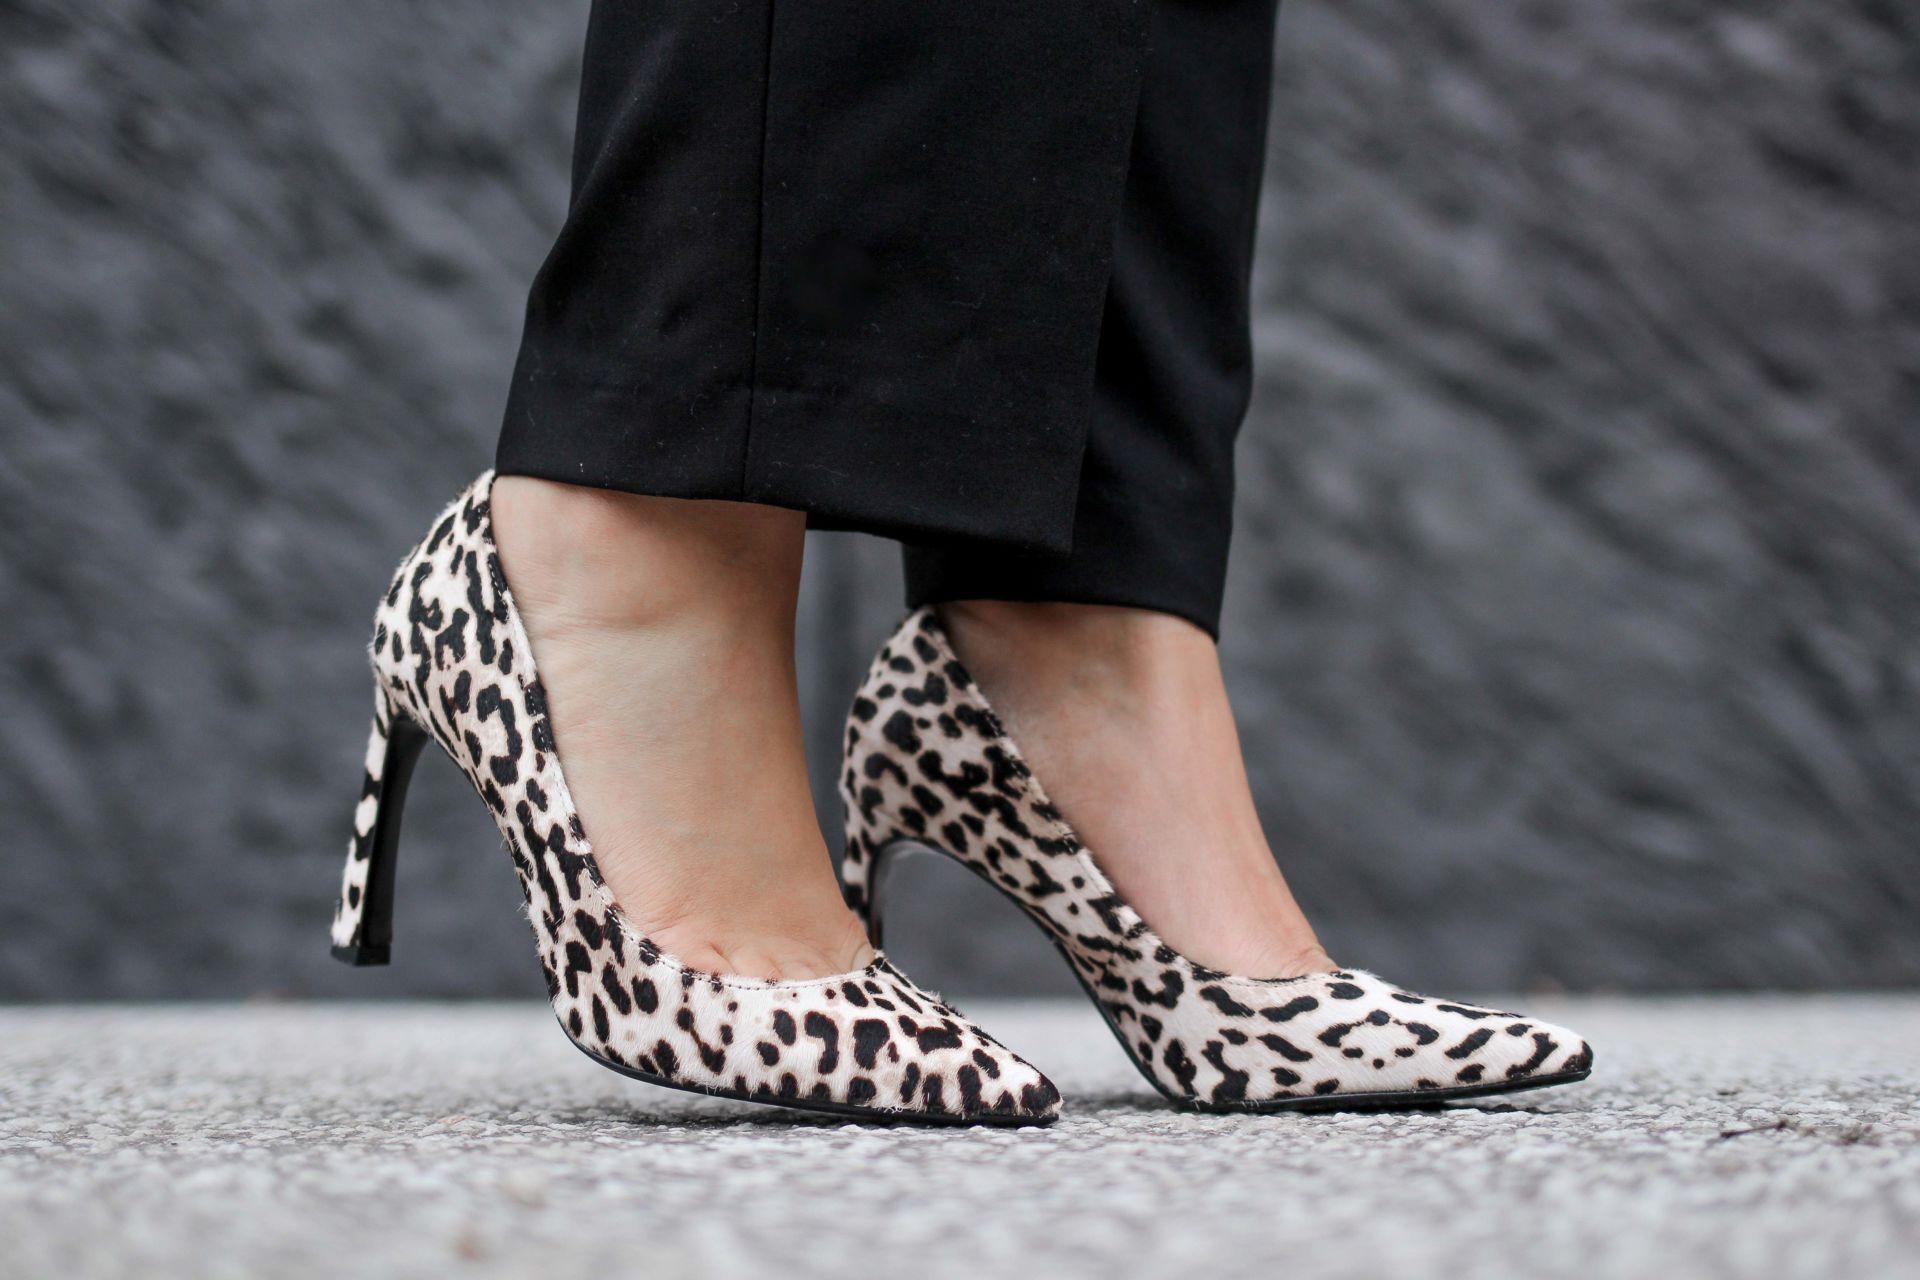 Escarpins léopards